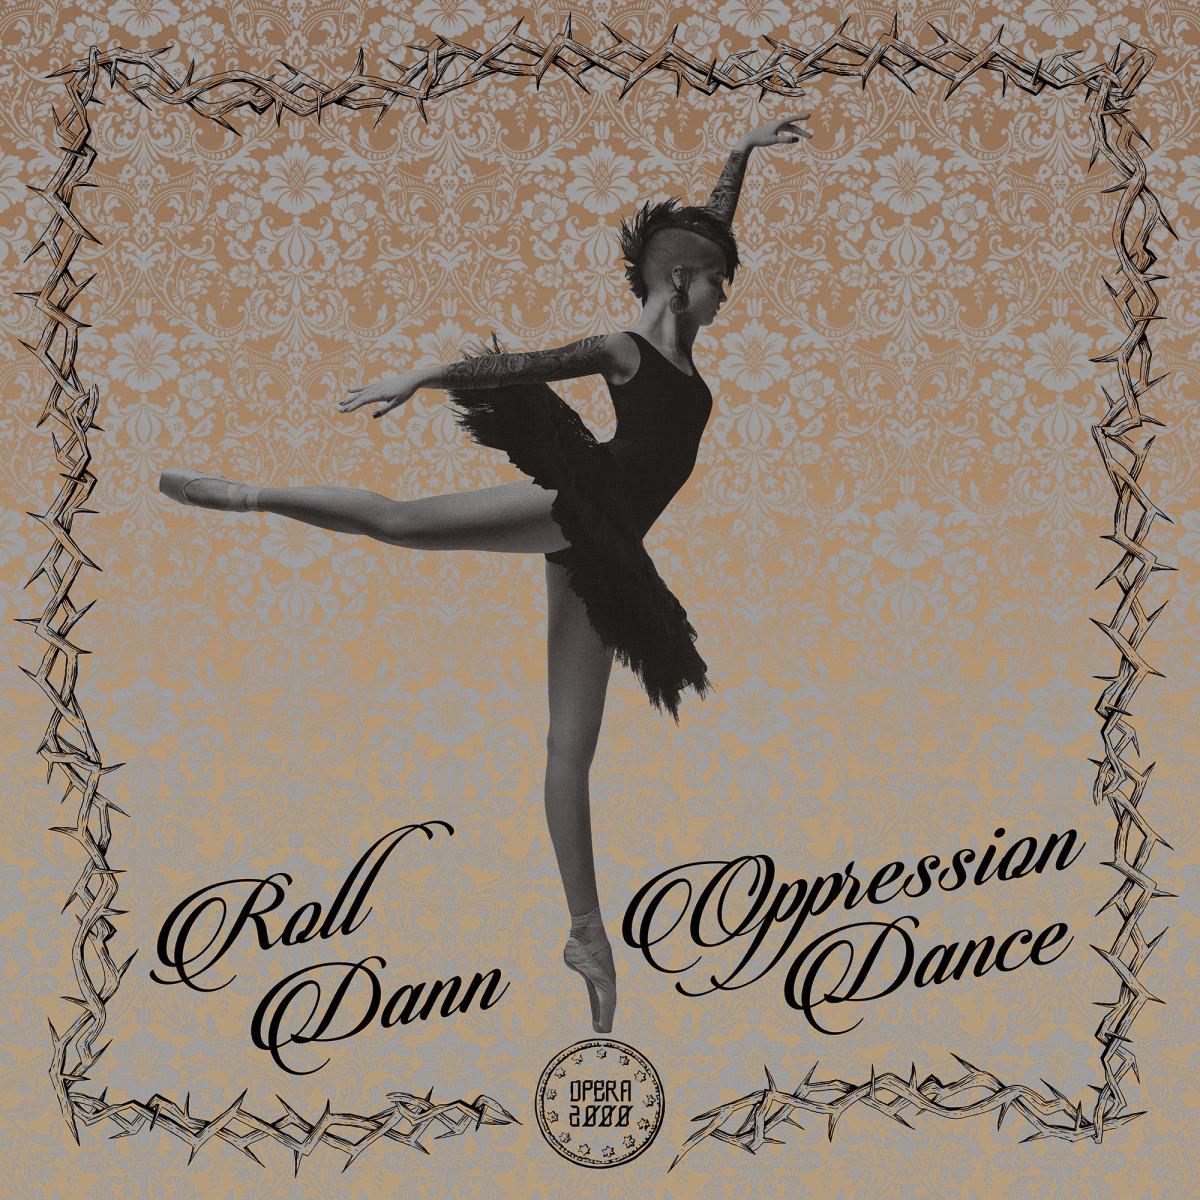 Roll Dann - Oppression Dance [Opera 2000]